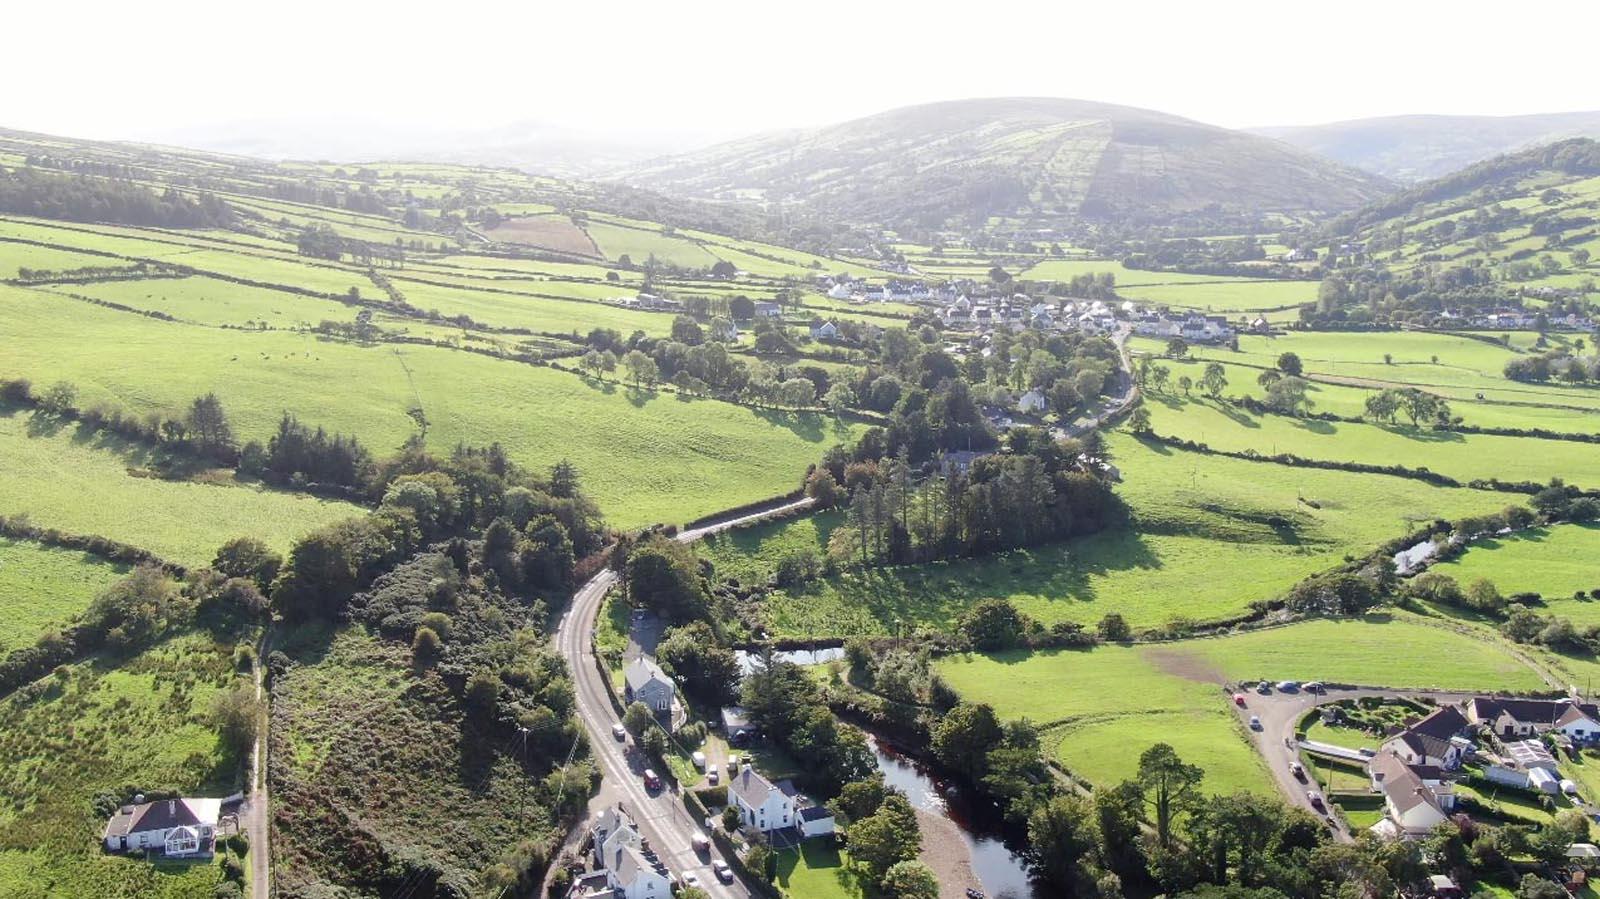 Photo: Aerial drone photography and video production services Dublin and Ireland portfolio - screenshot 5 of Cushendun video